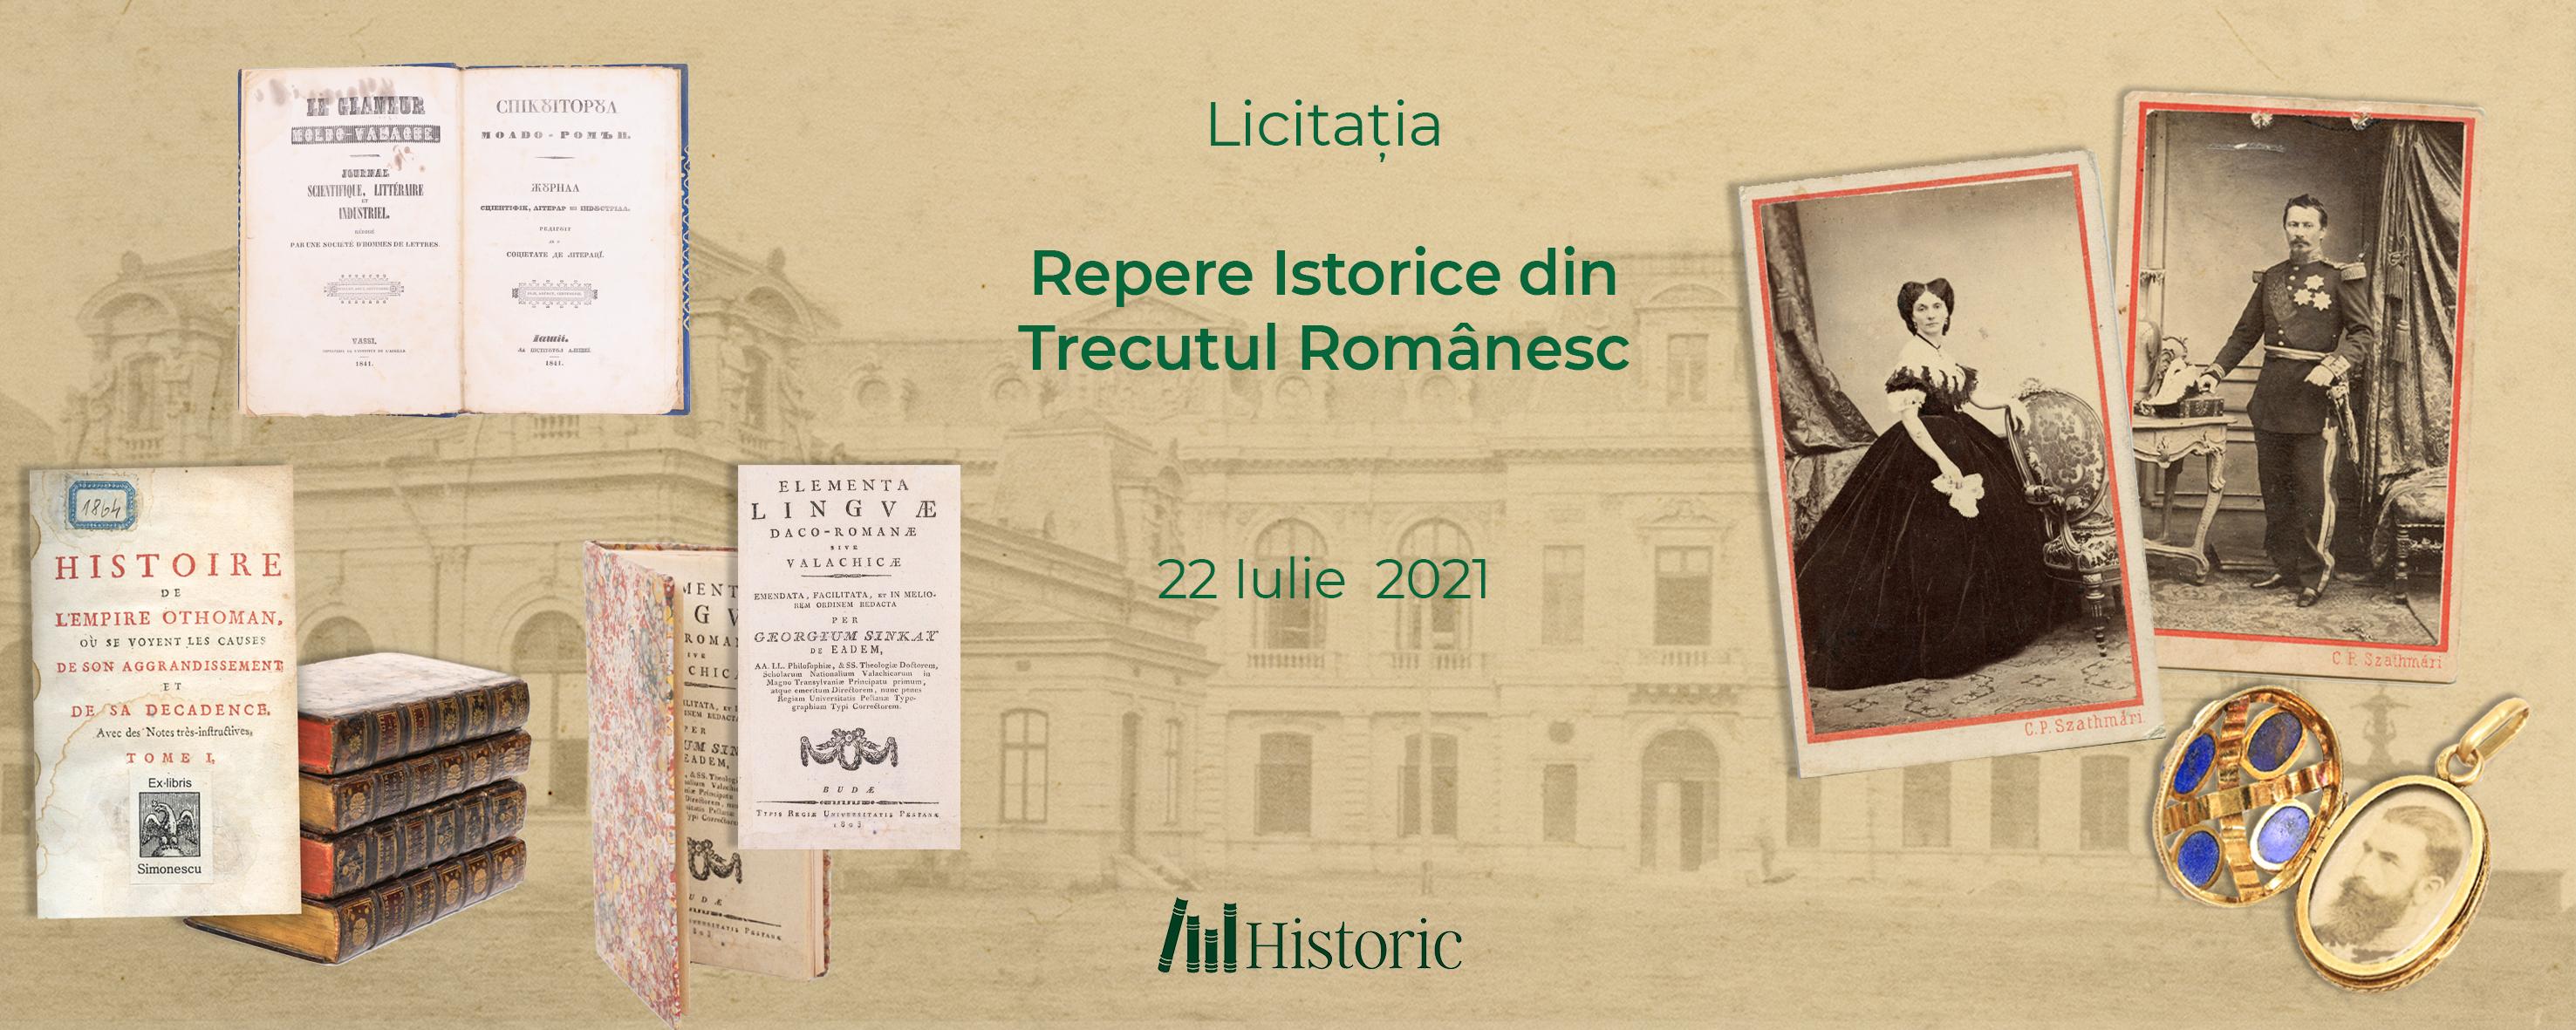 Licitatia Repere istorice din trecutul romanesc